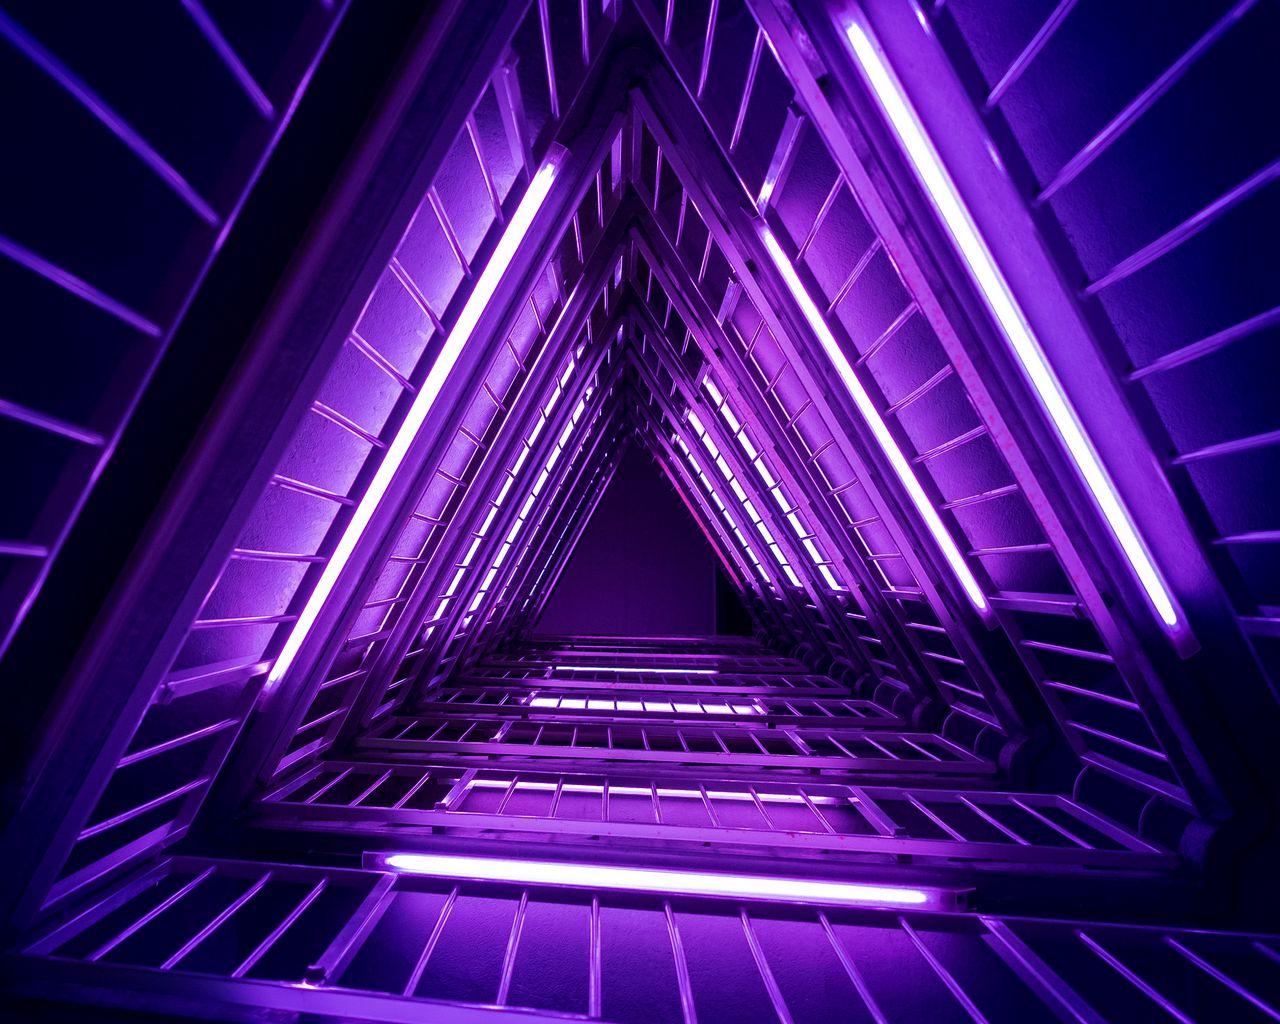 1280x1024 Wallpaper ladder, purple, light